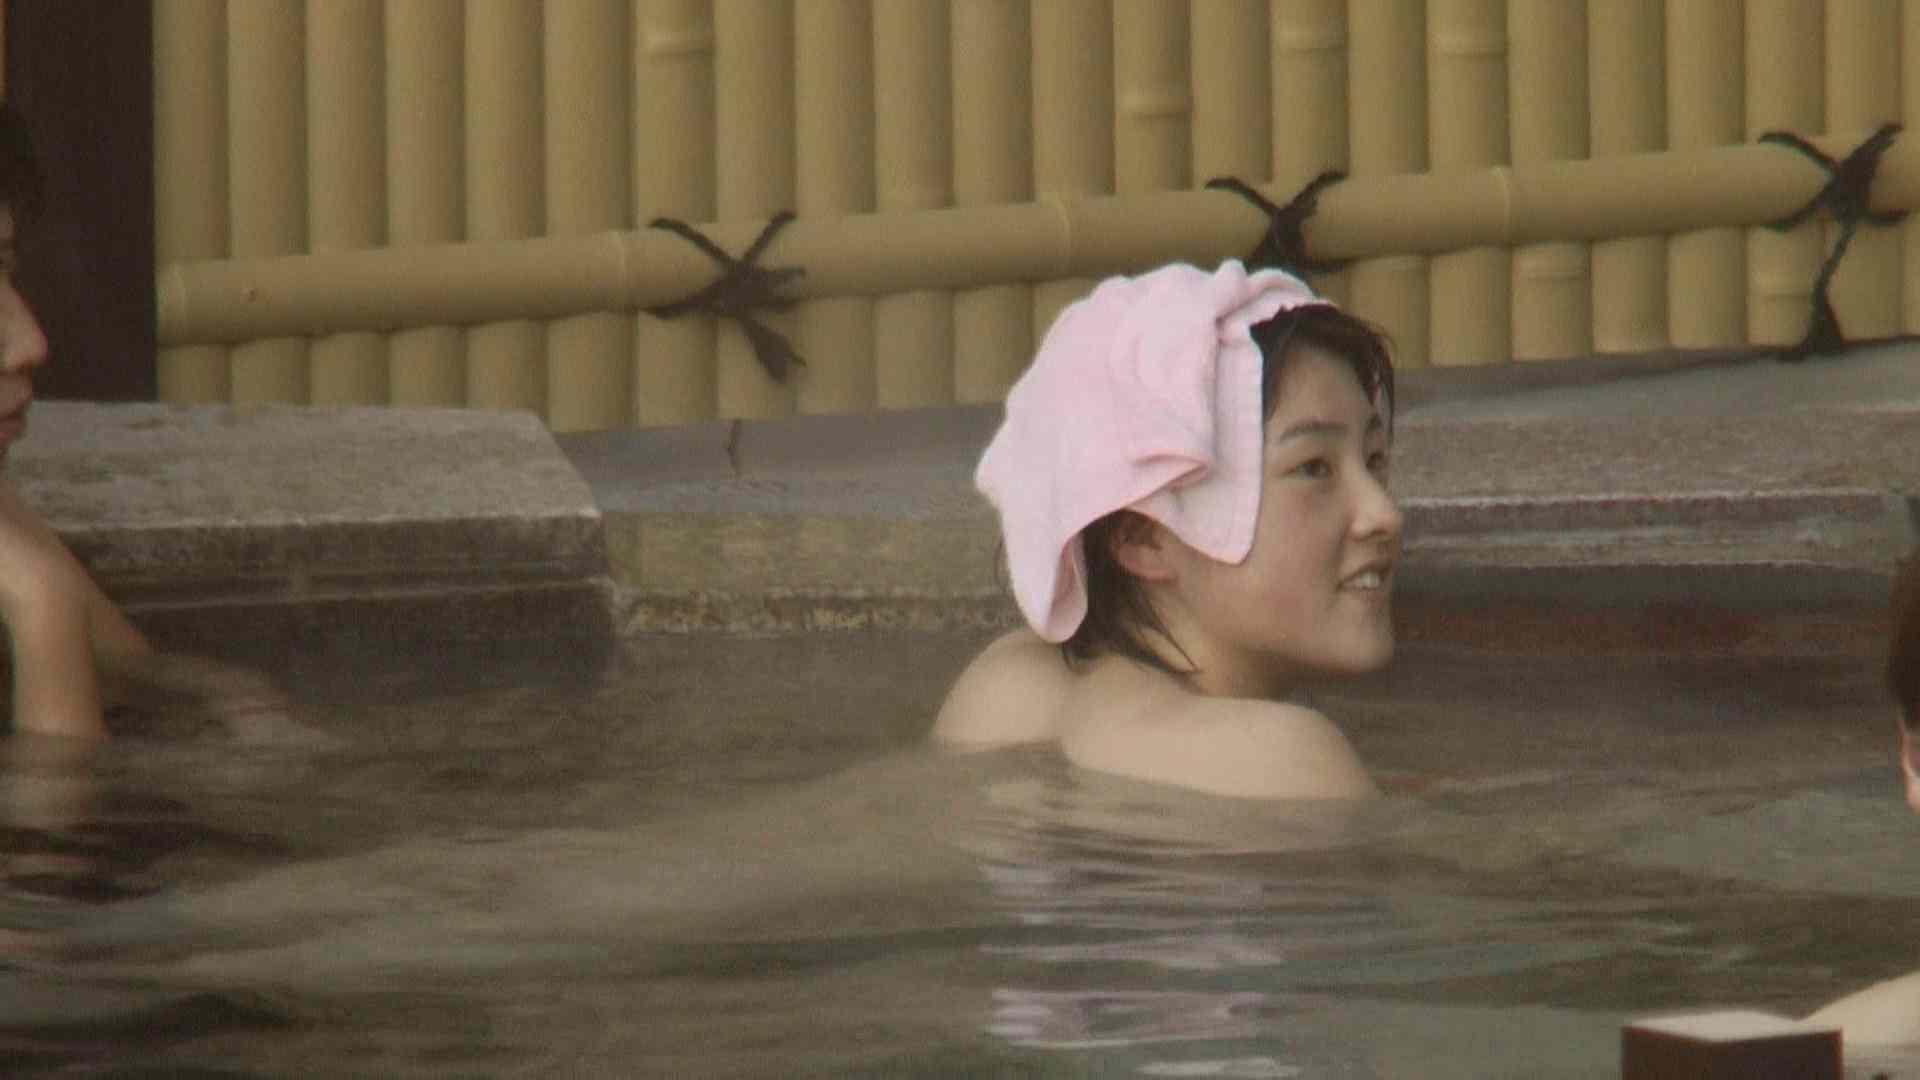 Aquaな露天風呂Vol.207 OLのプライベート アダルト動画キャプチャ 11pic 11